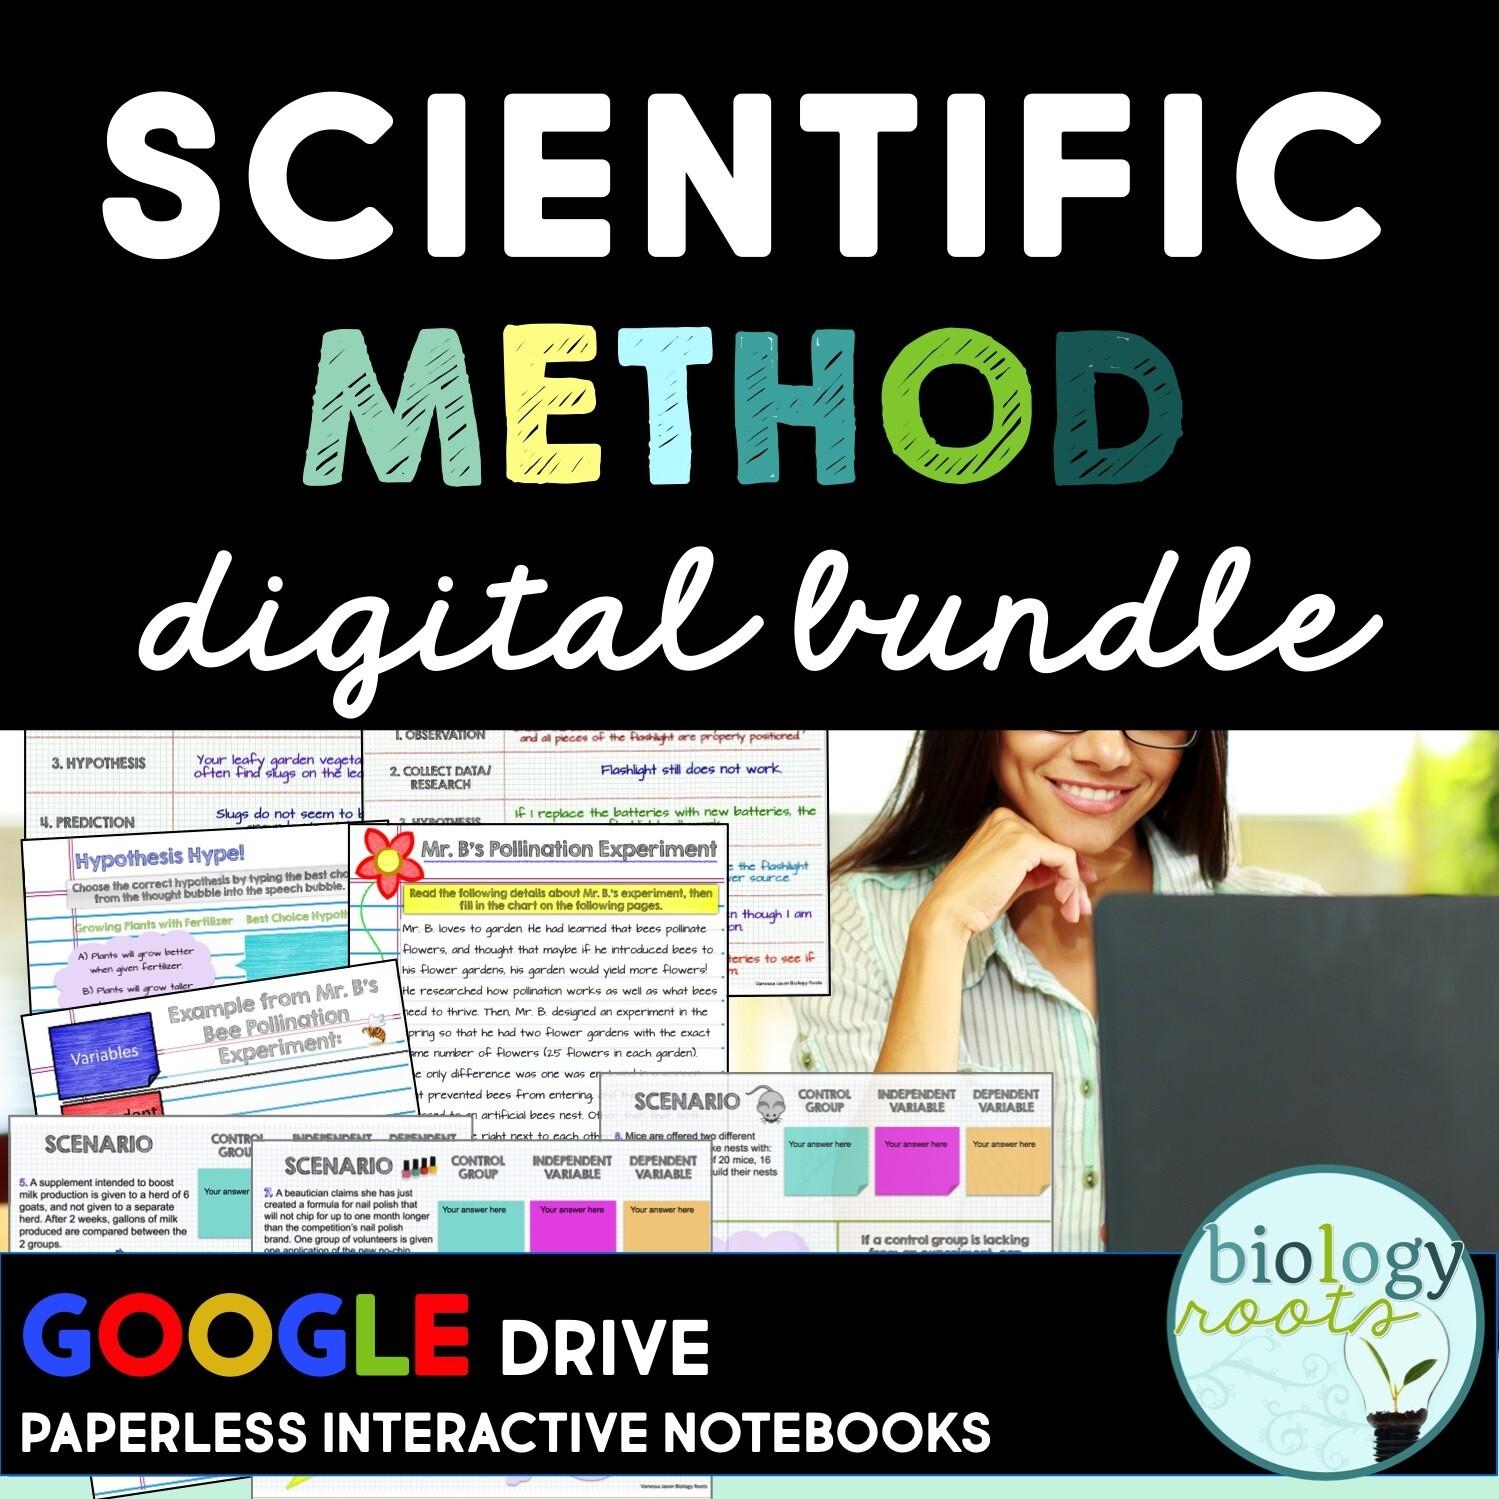 Scientific Method Digital Notebook